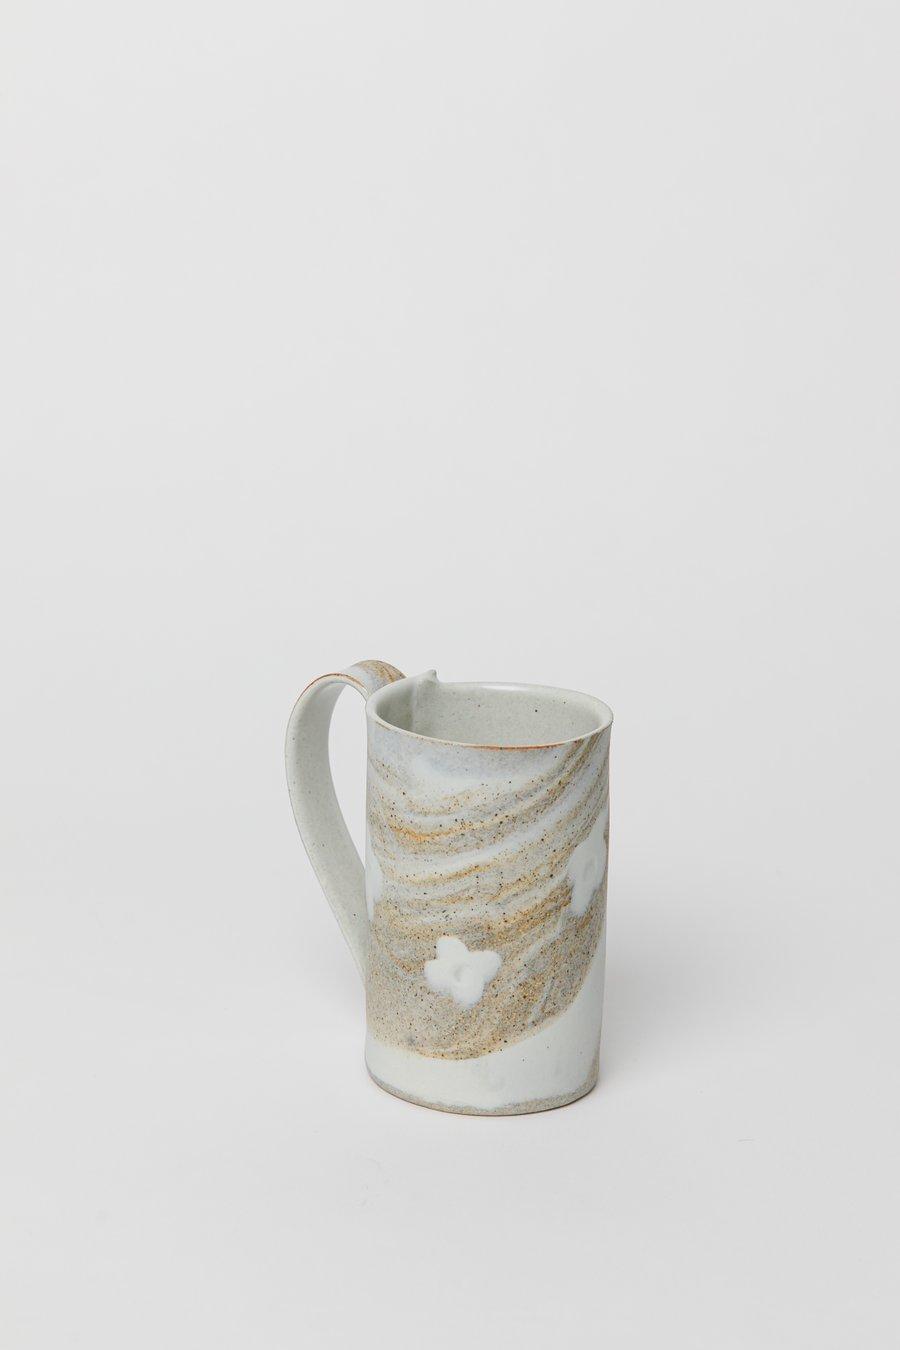 Image of Tall Mug - White Flower Granite Sandy Stoneware